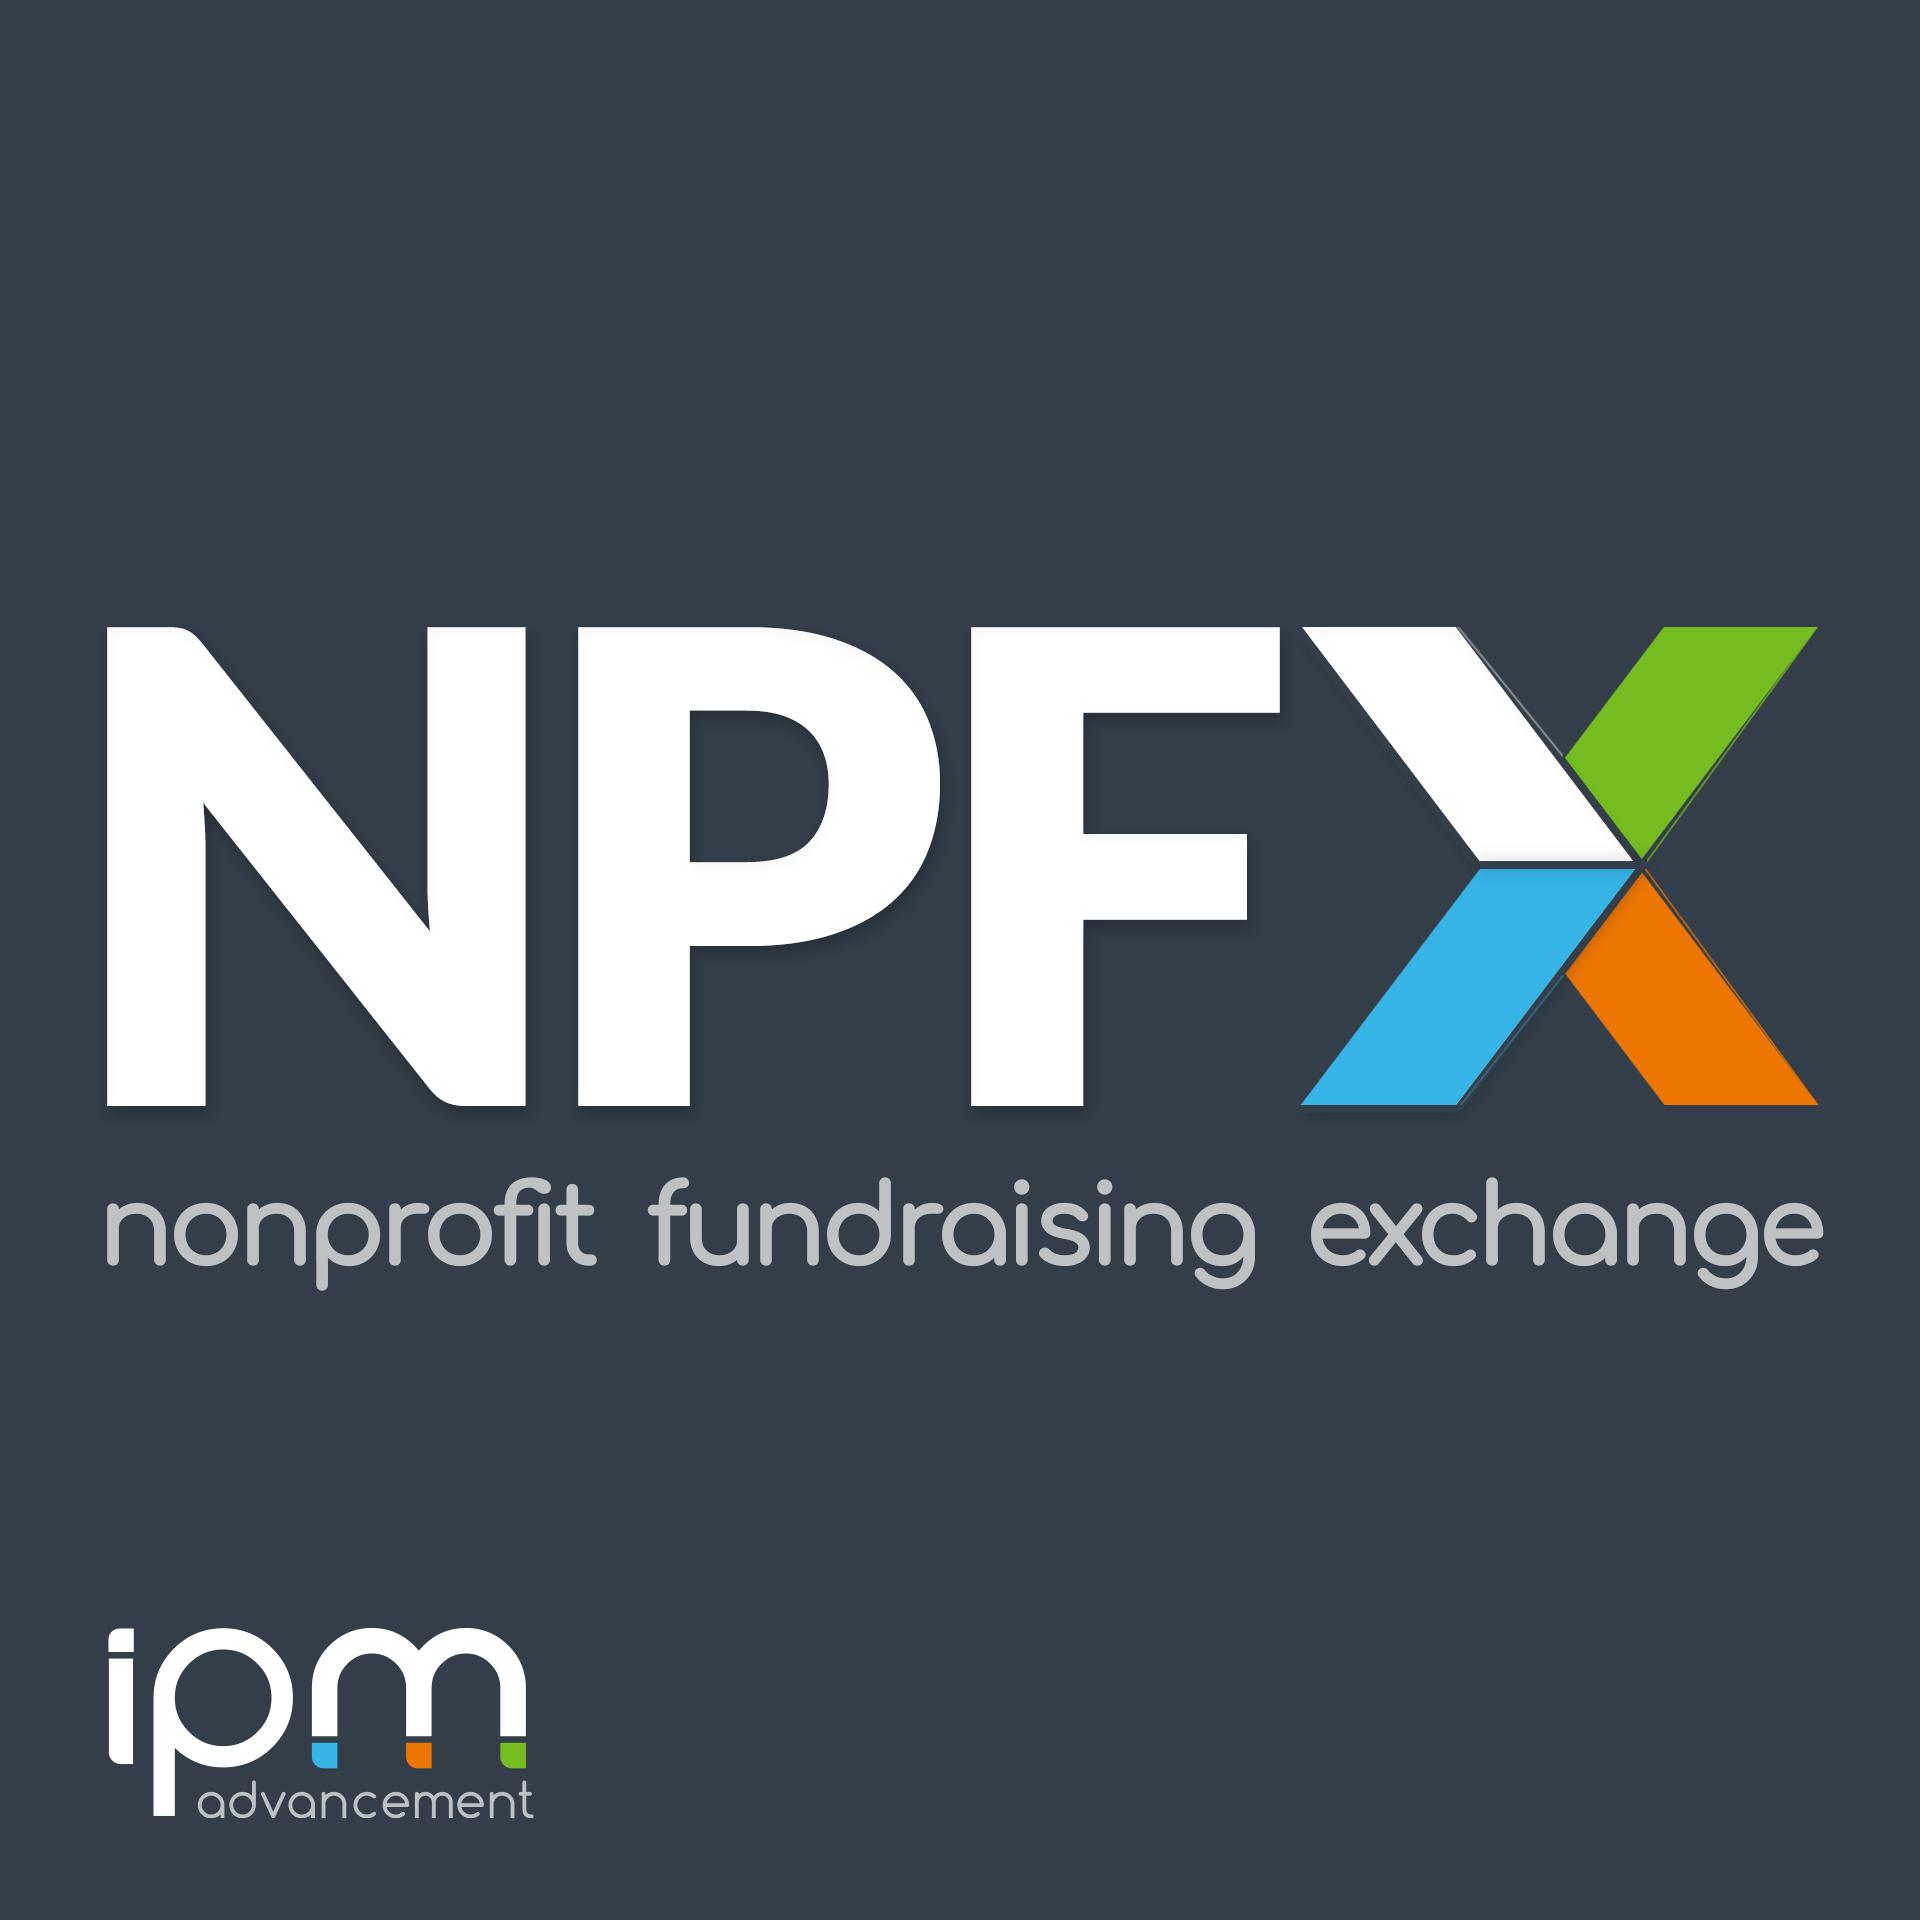 NPFX: The Nonprofit Fundraising Exchange show art